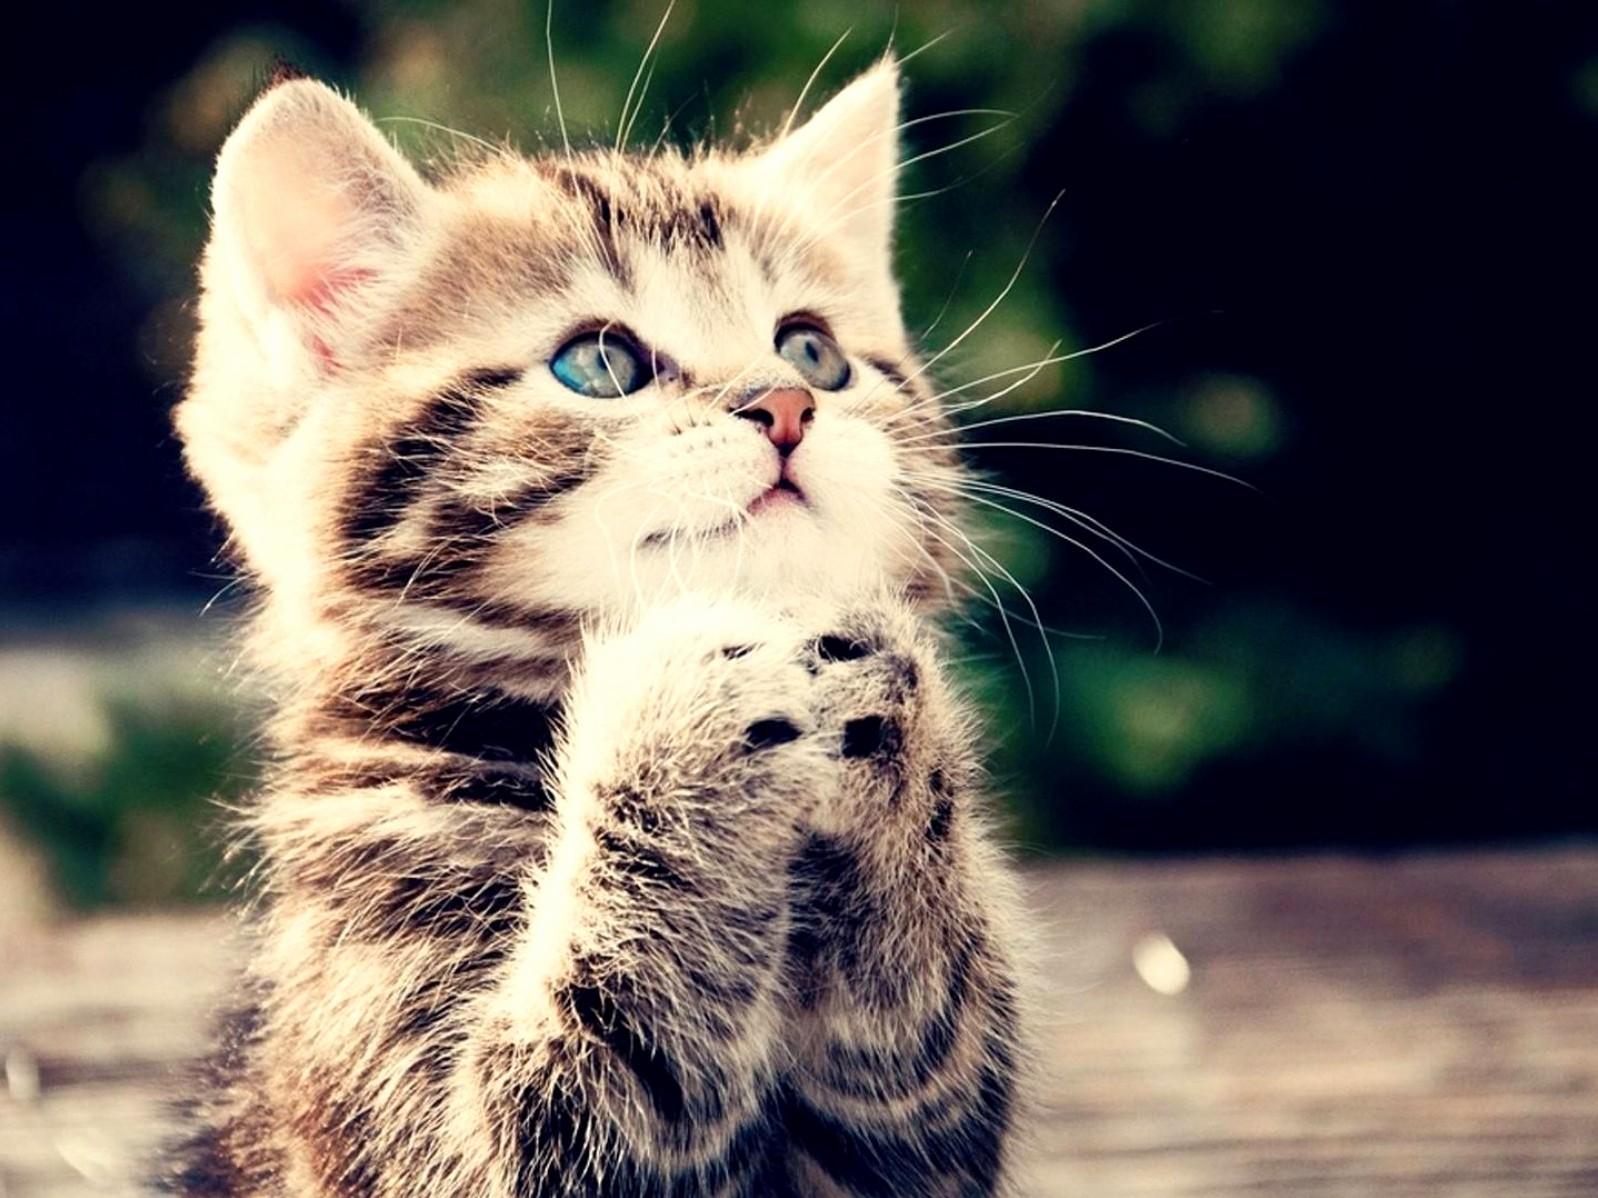 O god listen to my prayers